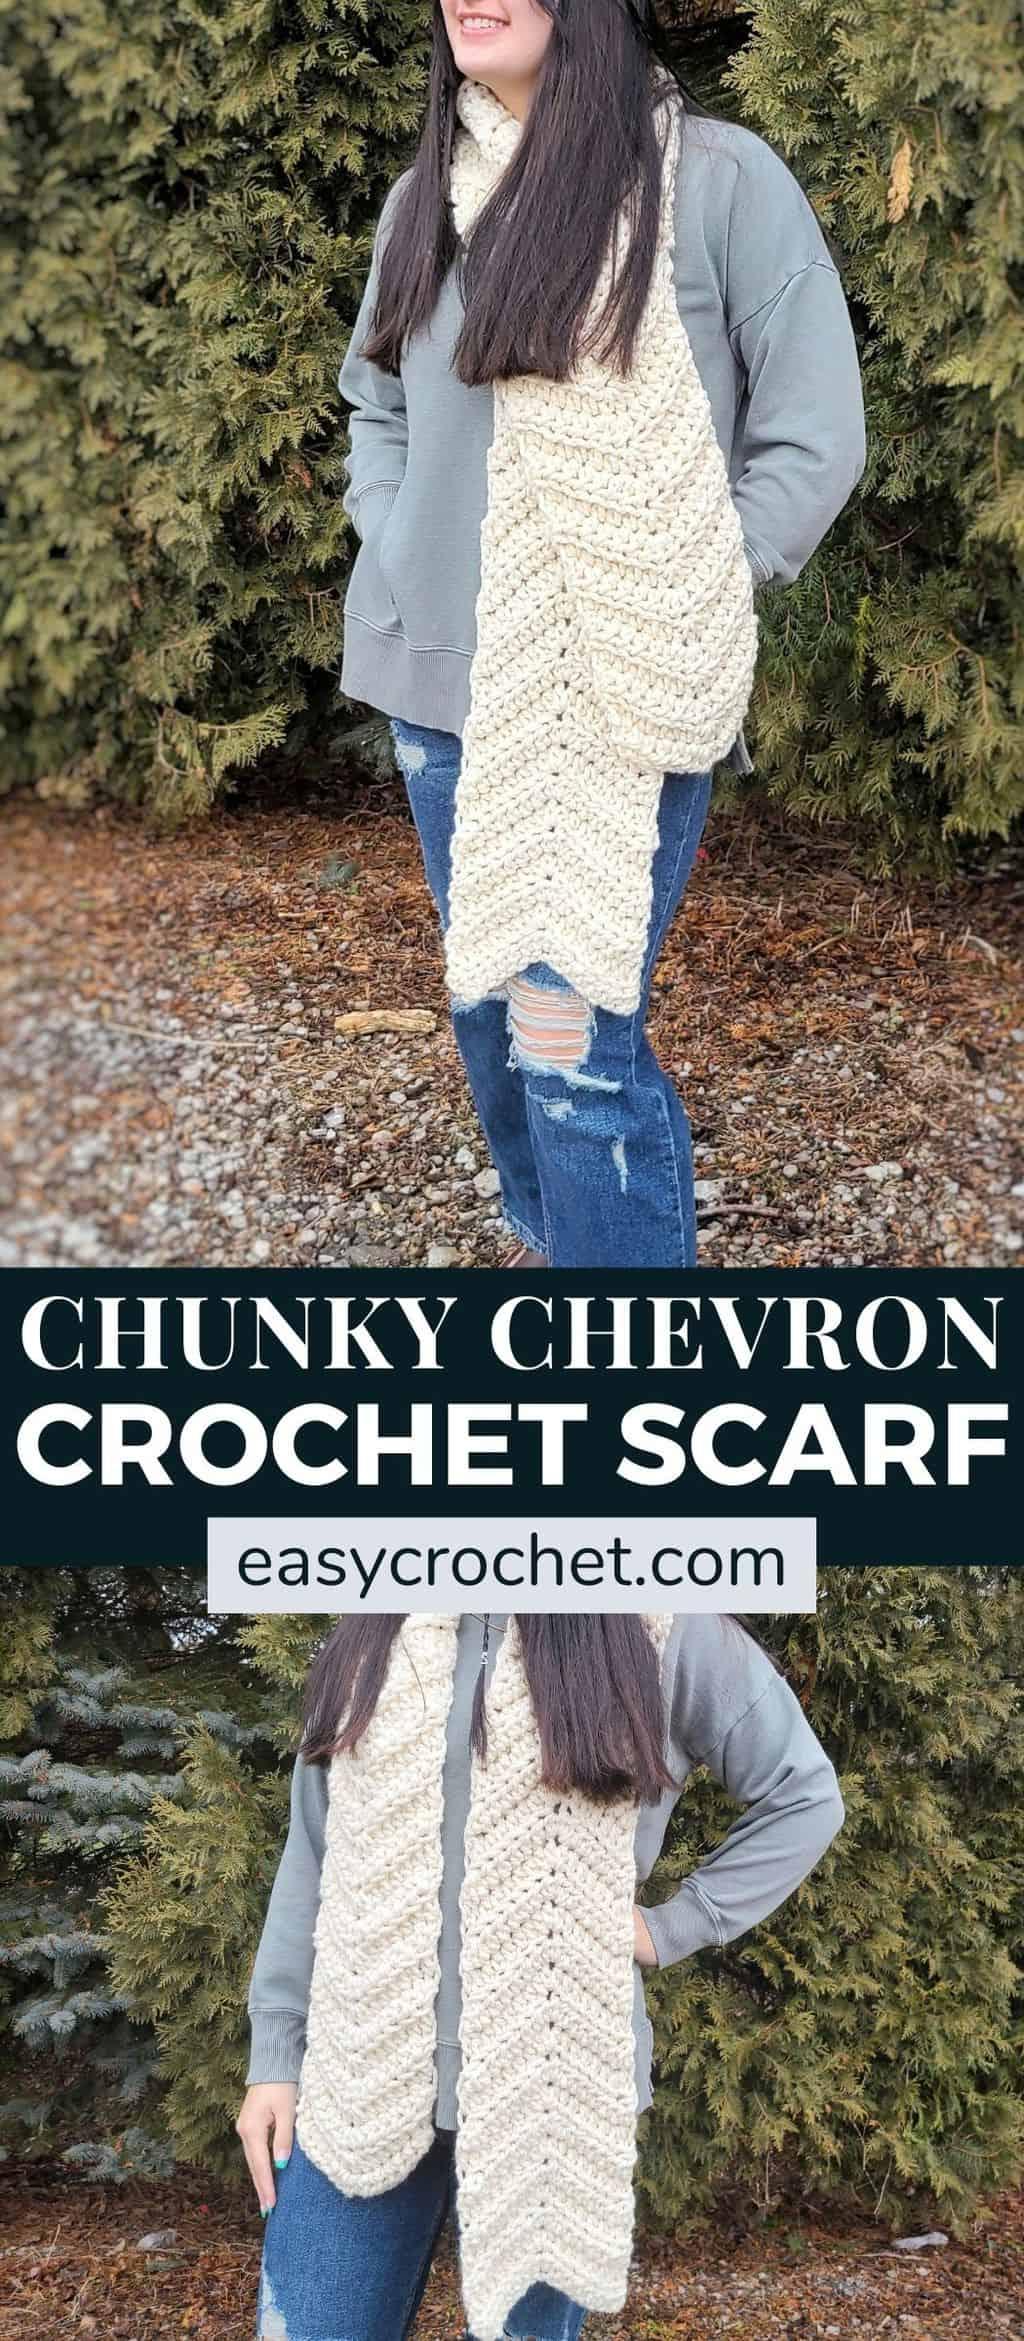 Chunky chevron crochet scarf